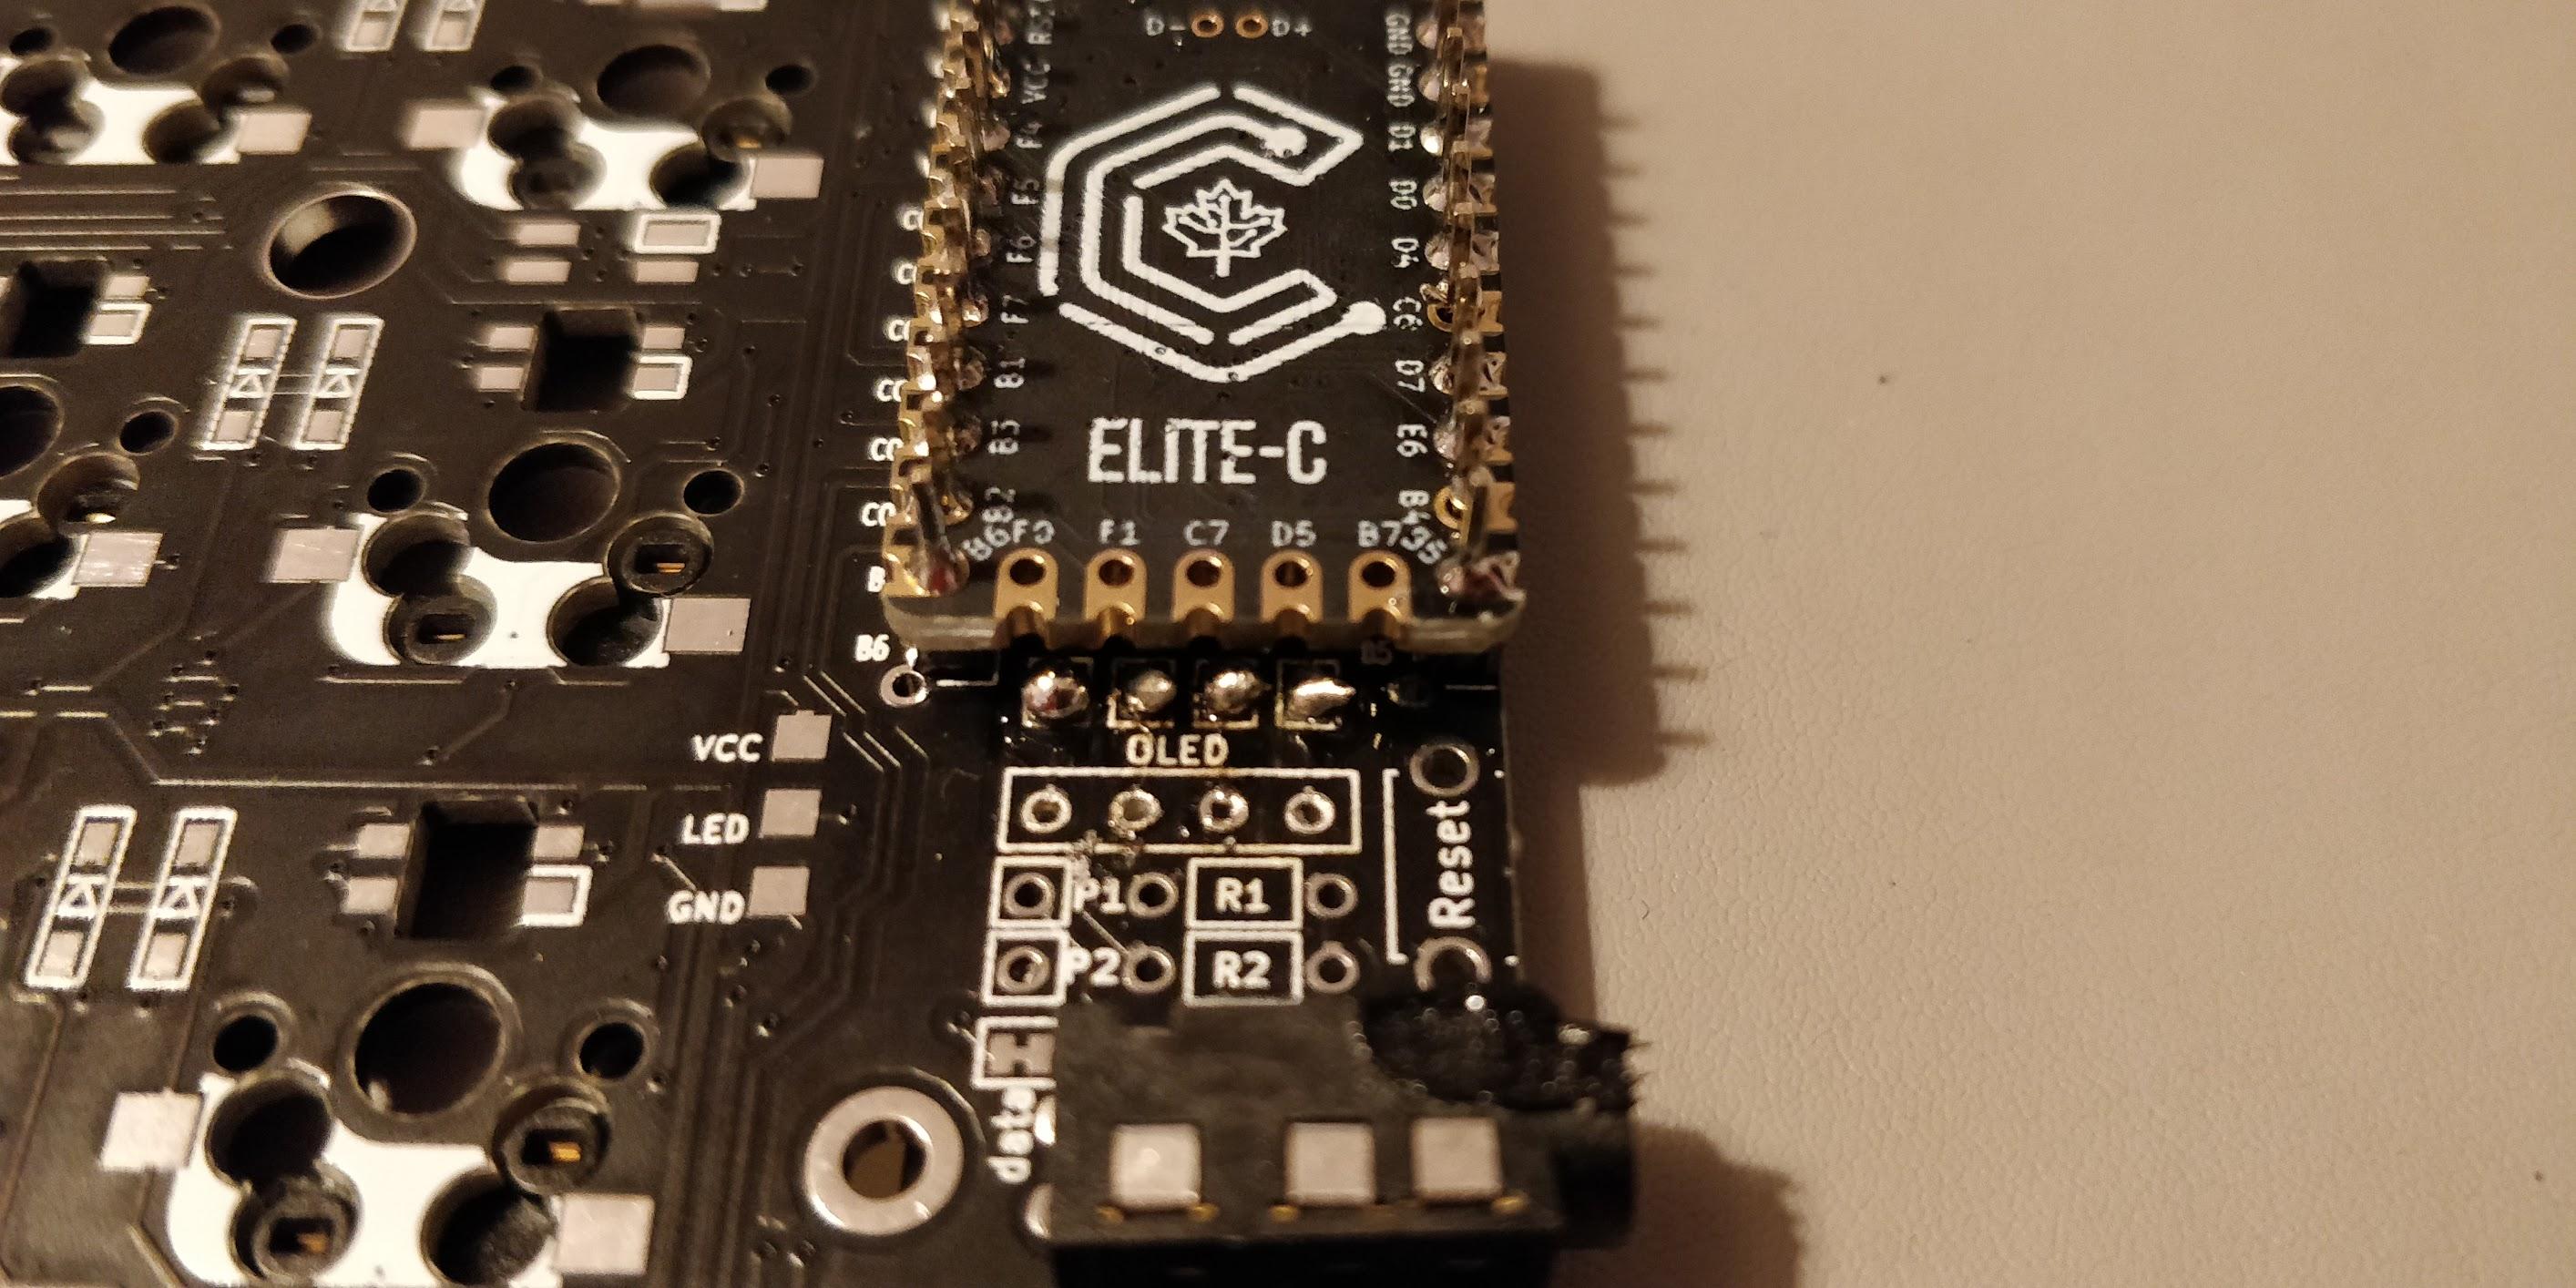 Corne crkbd - failure - OLED soldering attempt 1